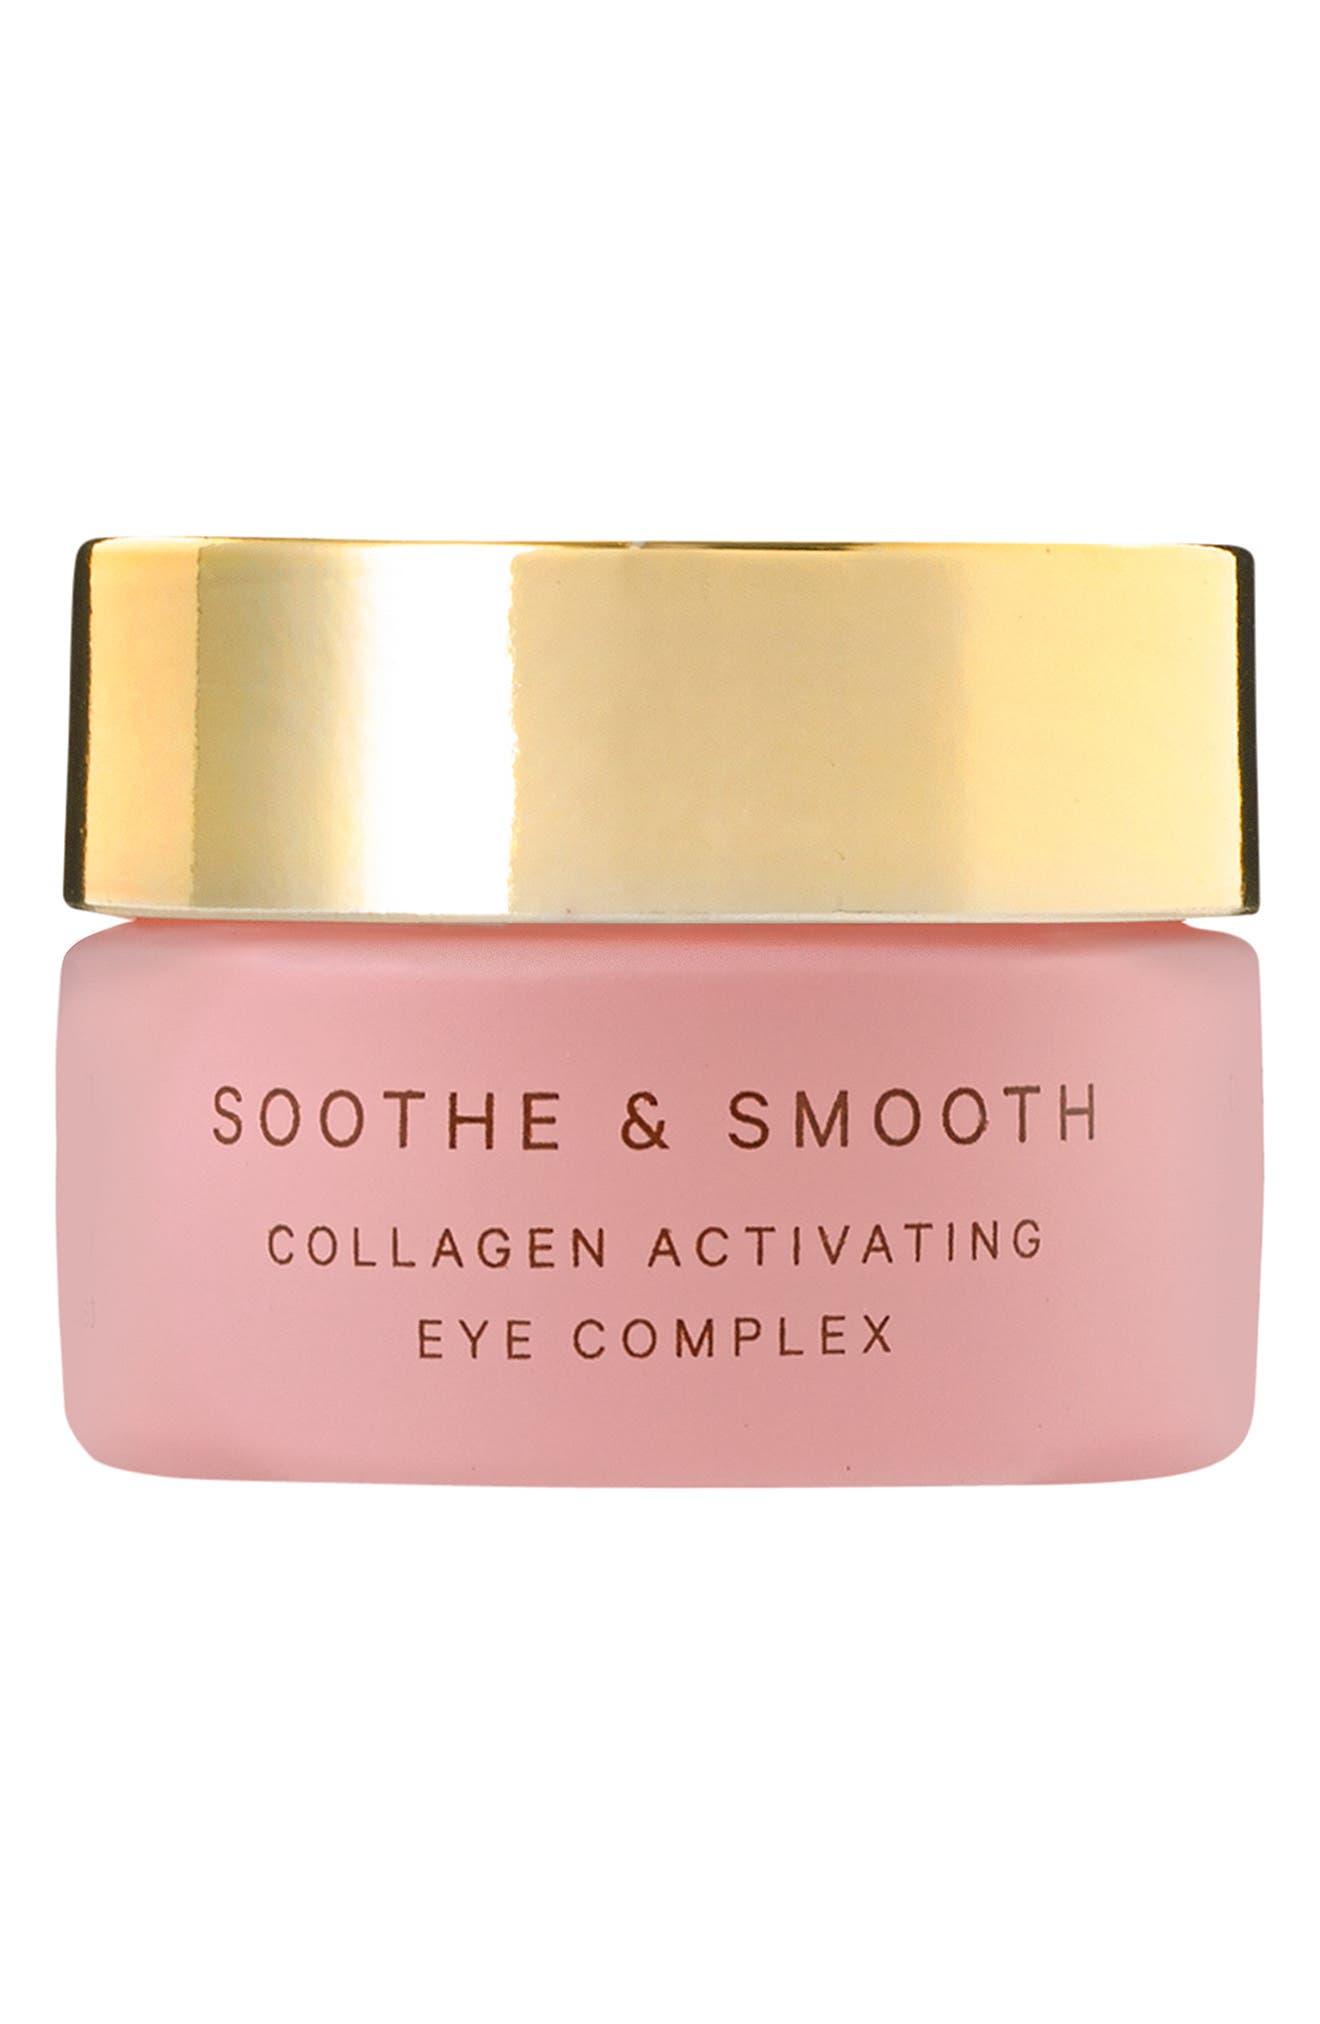 Soothe & Smooth Collagen Activating Eye Complex Eye Cream